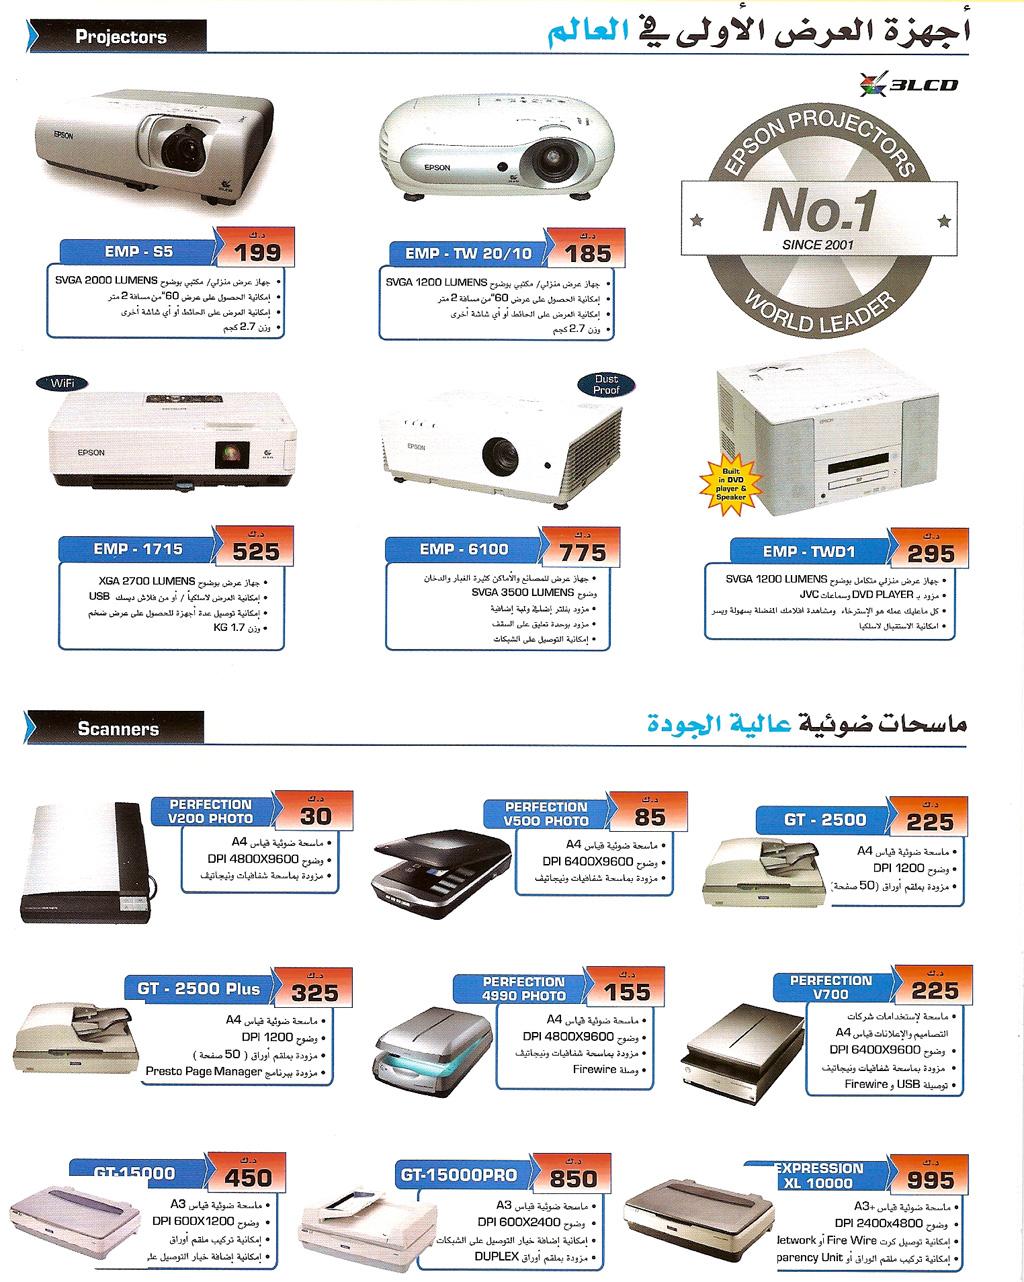 Al Sarraf Computer Services - الصراف لخدمات الكمبيوتر